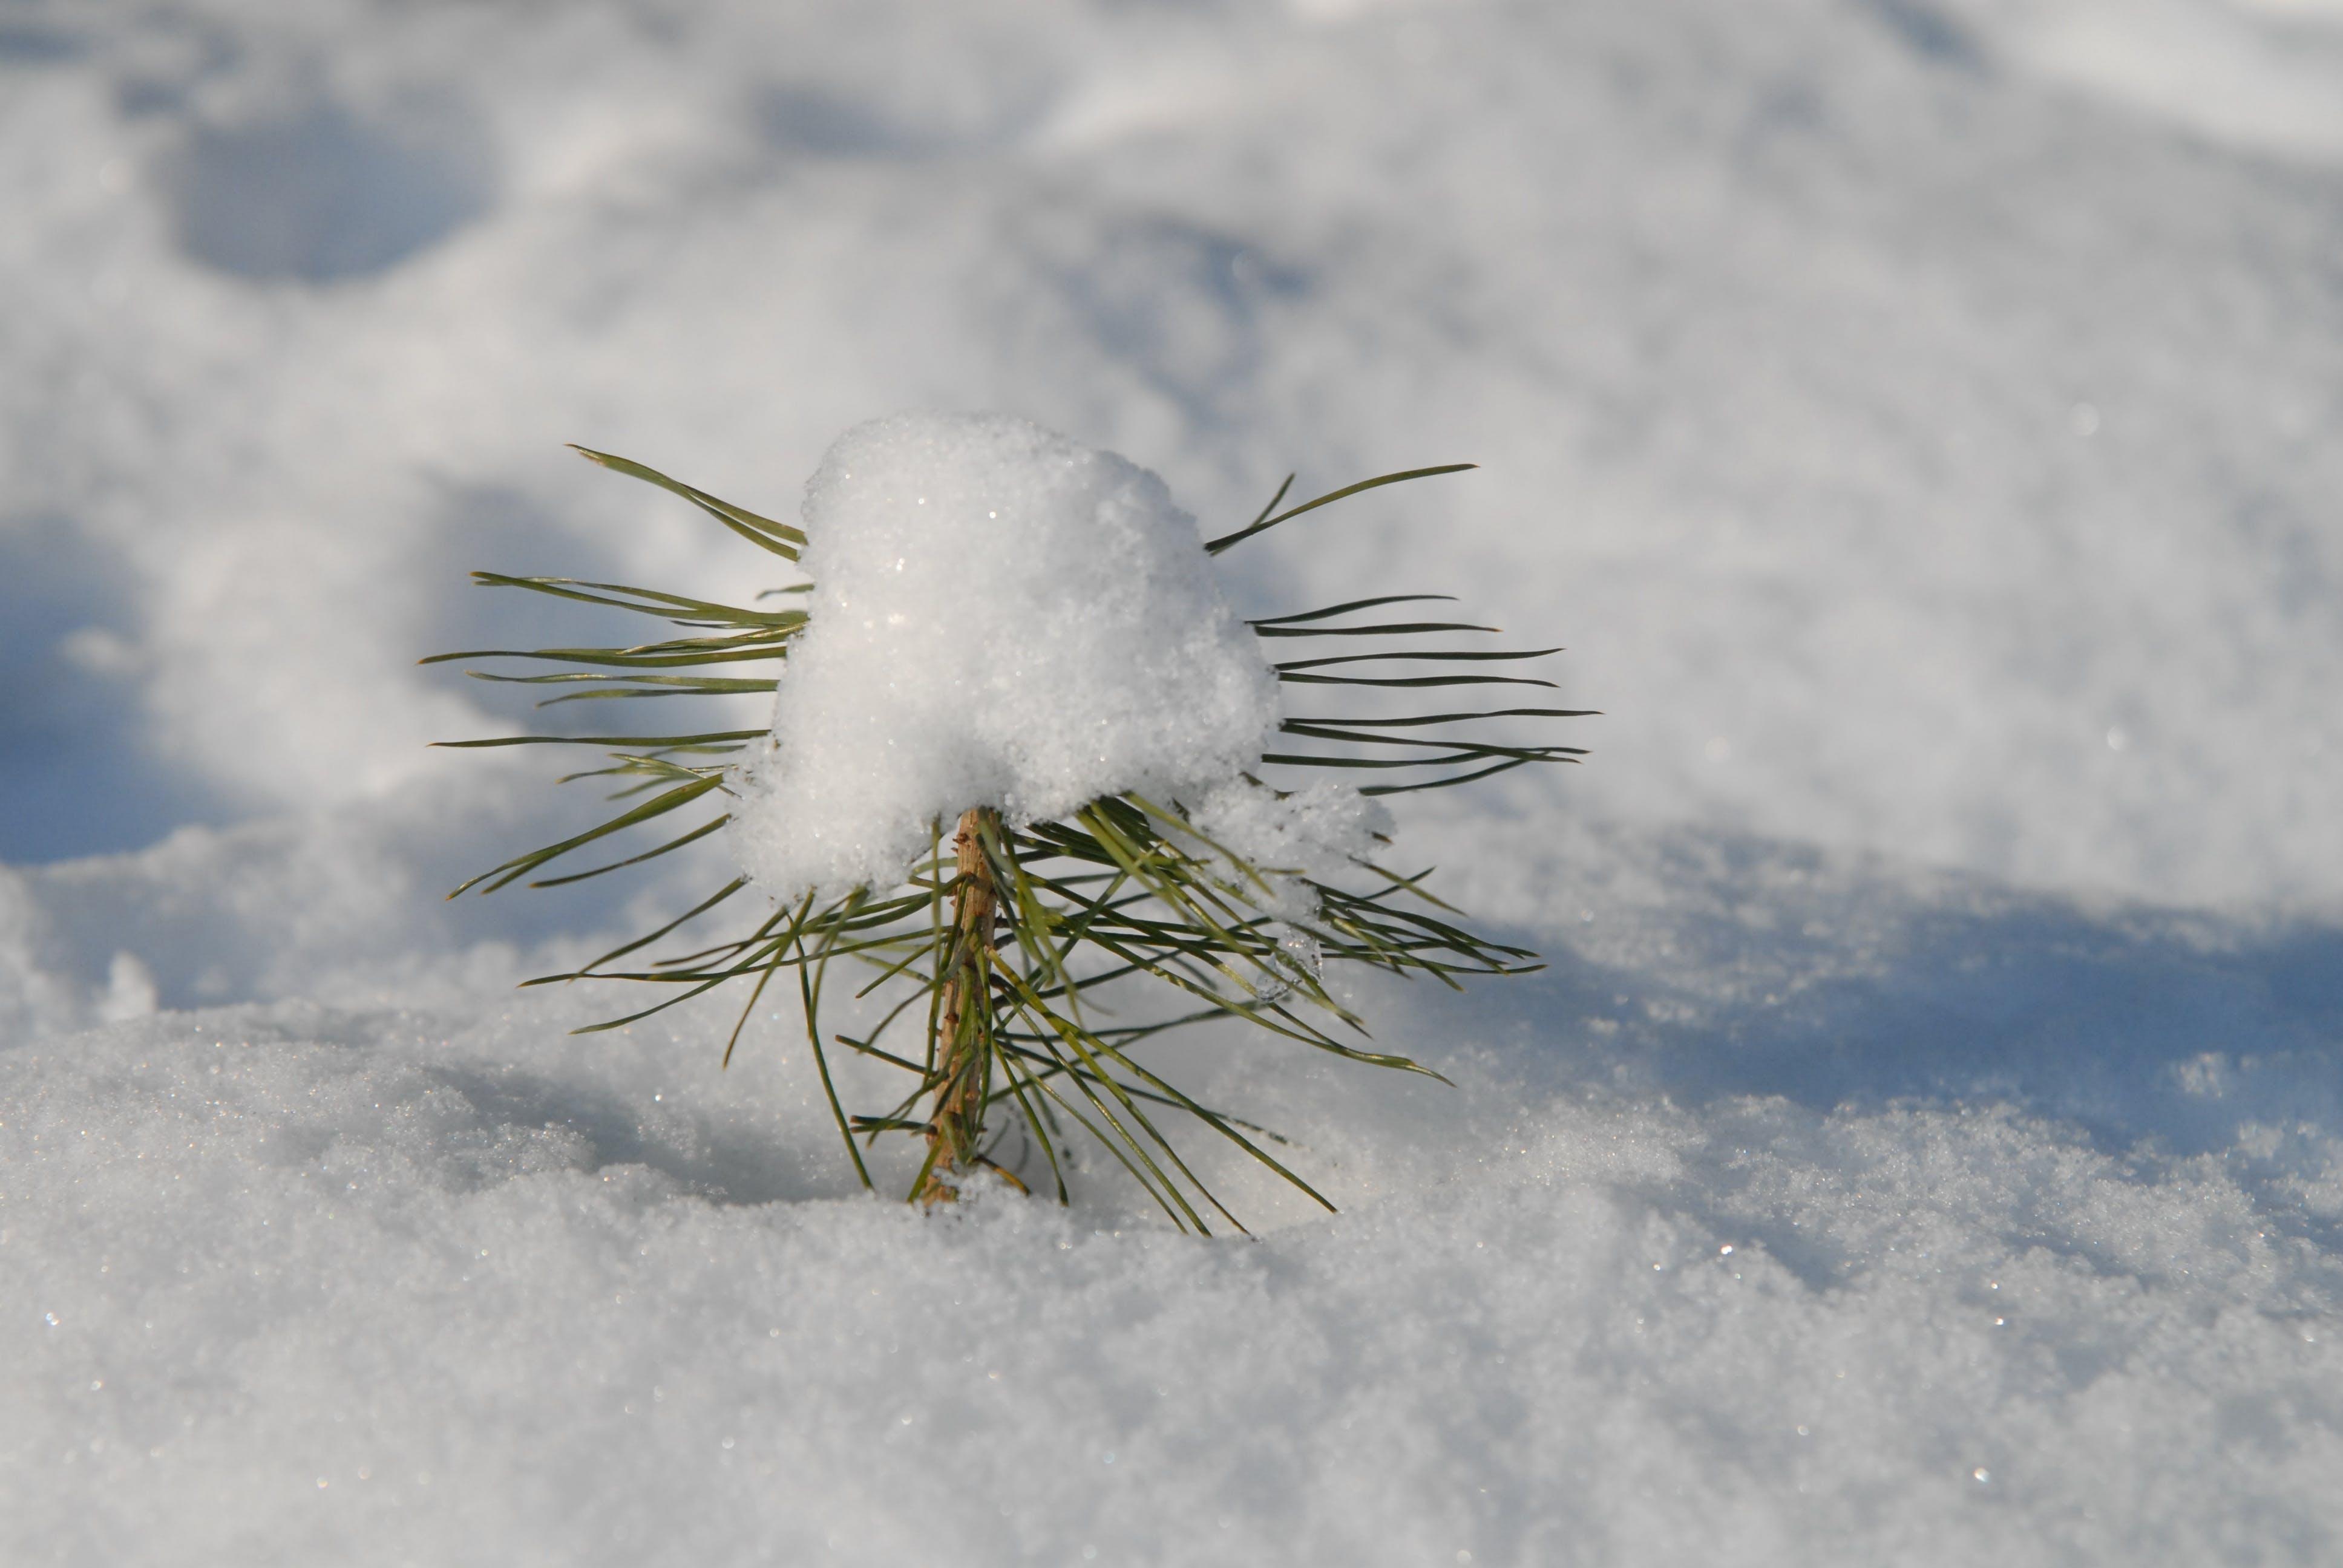 Free stock photo of cold, conifer, scion, snow